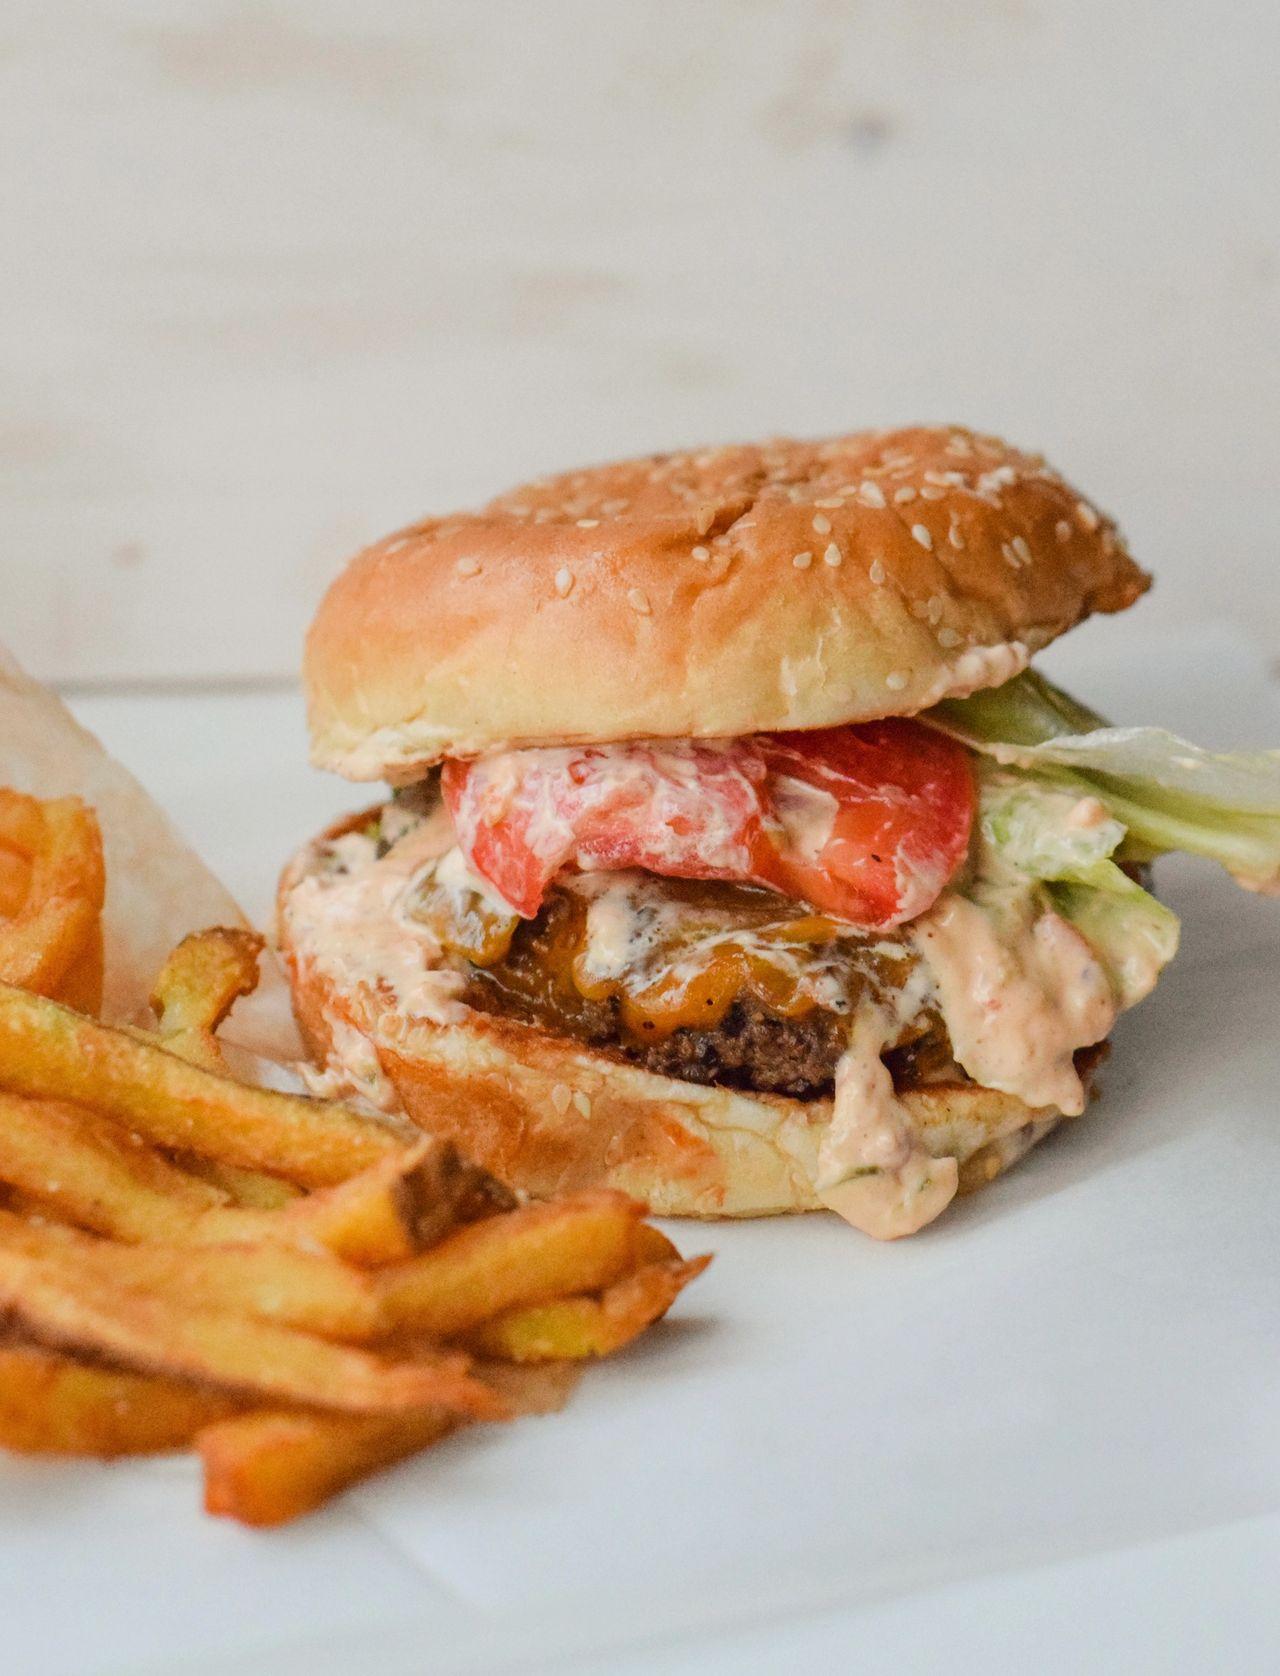 Burger from Farm Burger